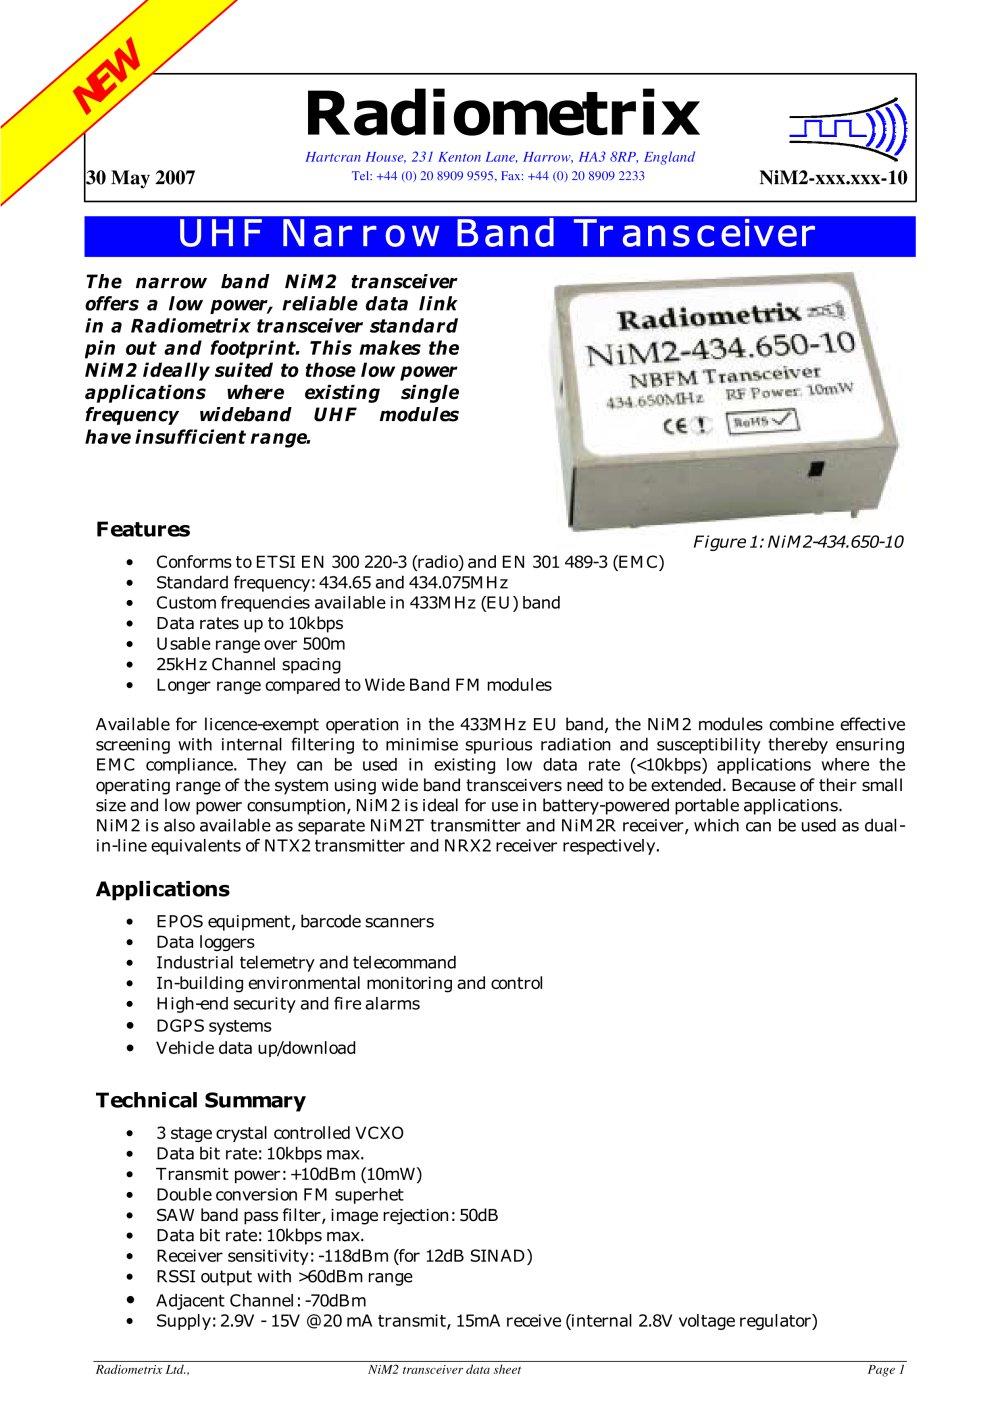 Nim2 Radiometrix Pdf Catalogue Technical Documentation Brochure Crystalcontrolledfm 1 11 Pages